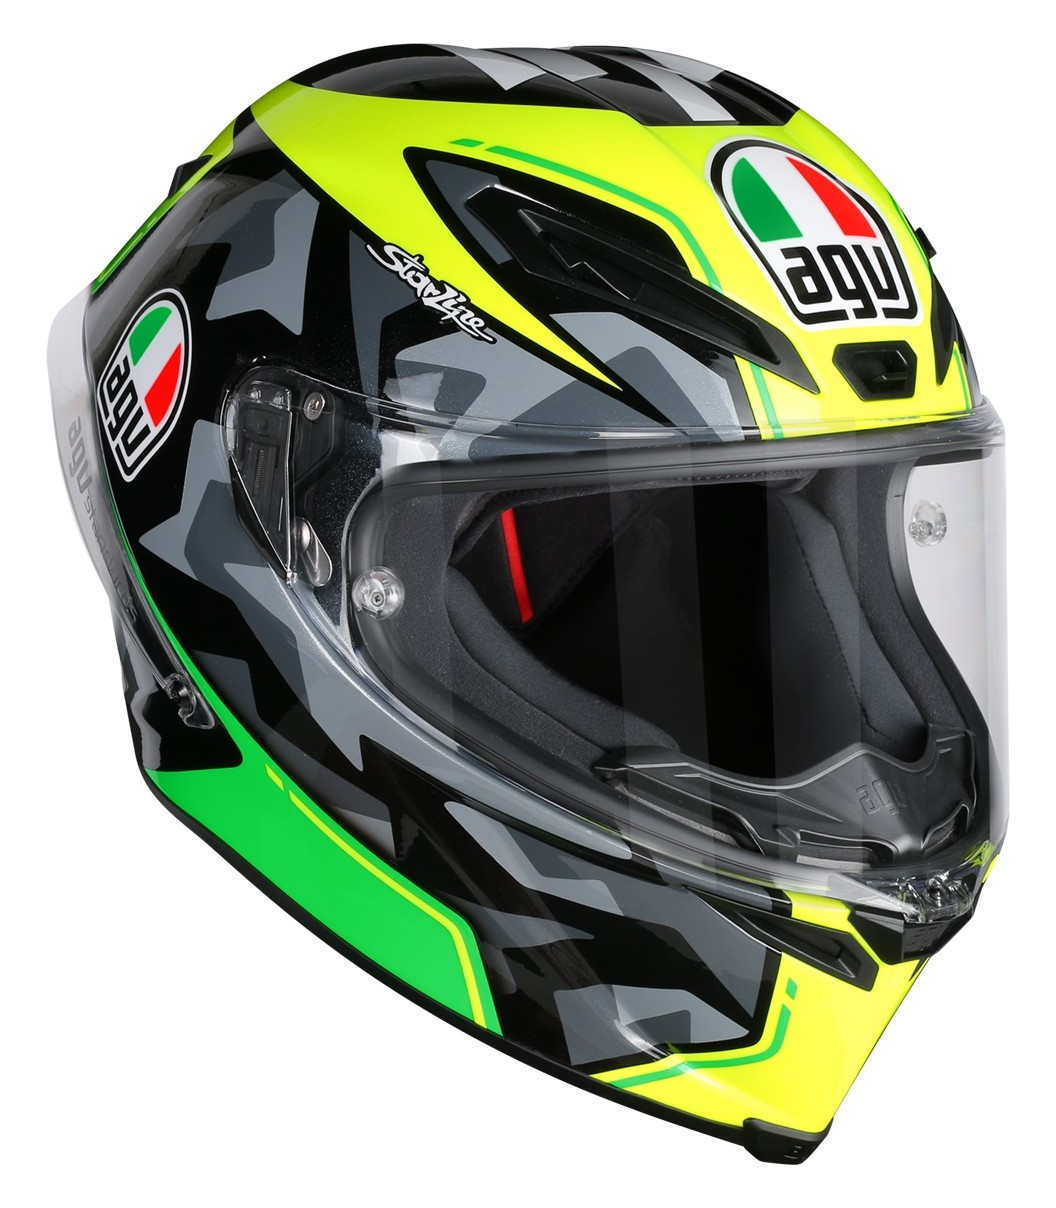 Team Suzuki Motorcycle Helmet